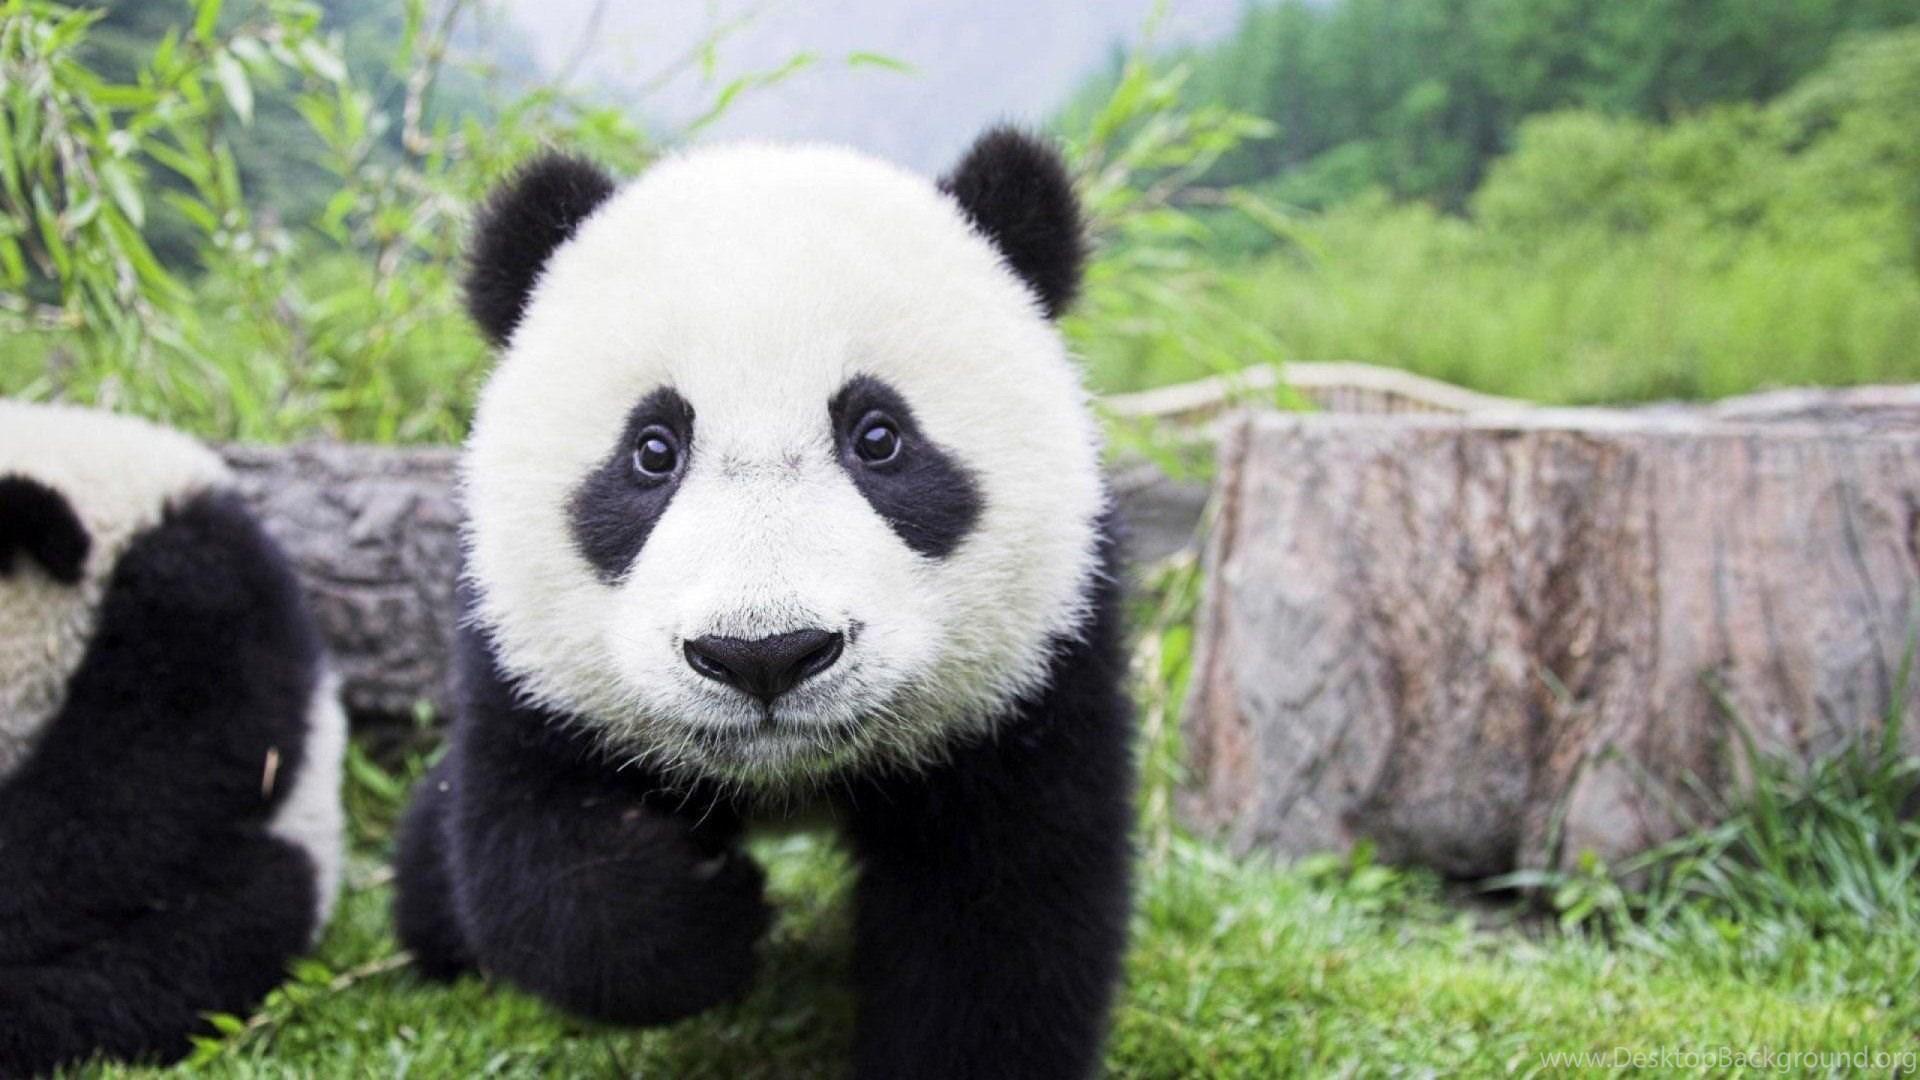 Cute Baby Panda Wallpapers Wallpaper Desktop Background